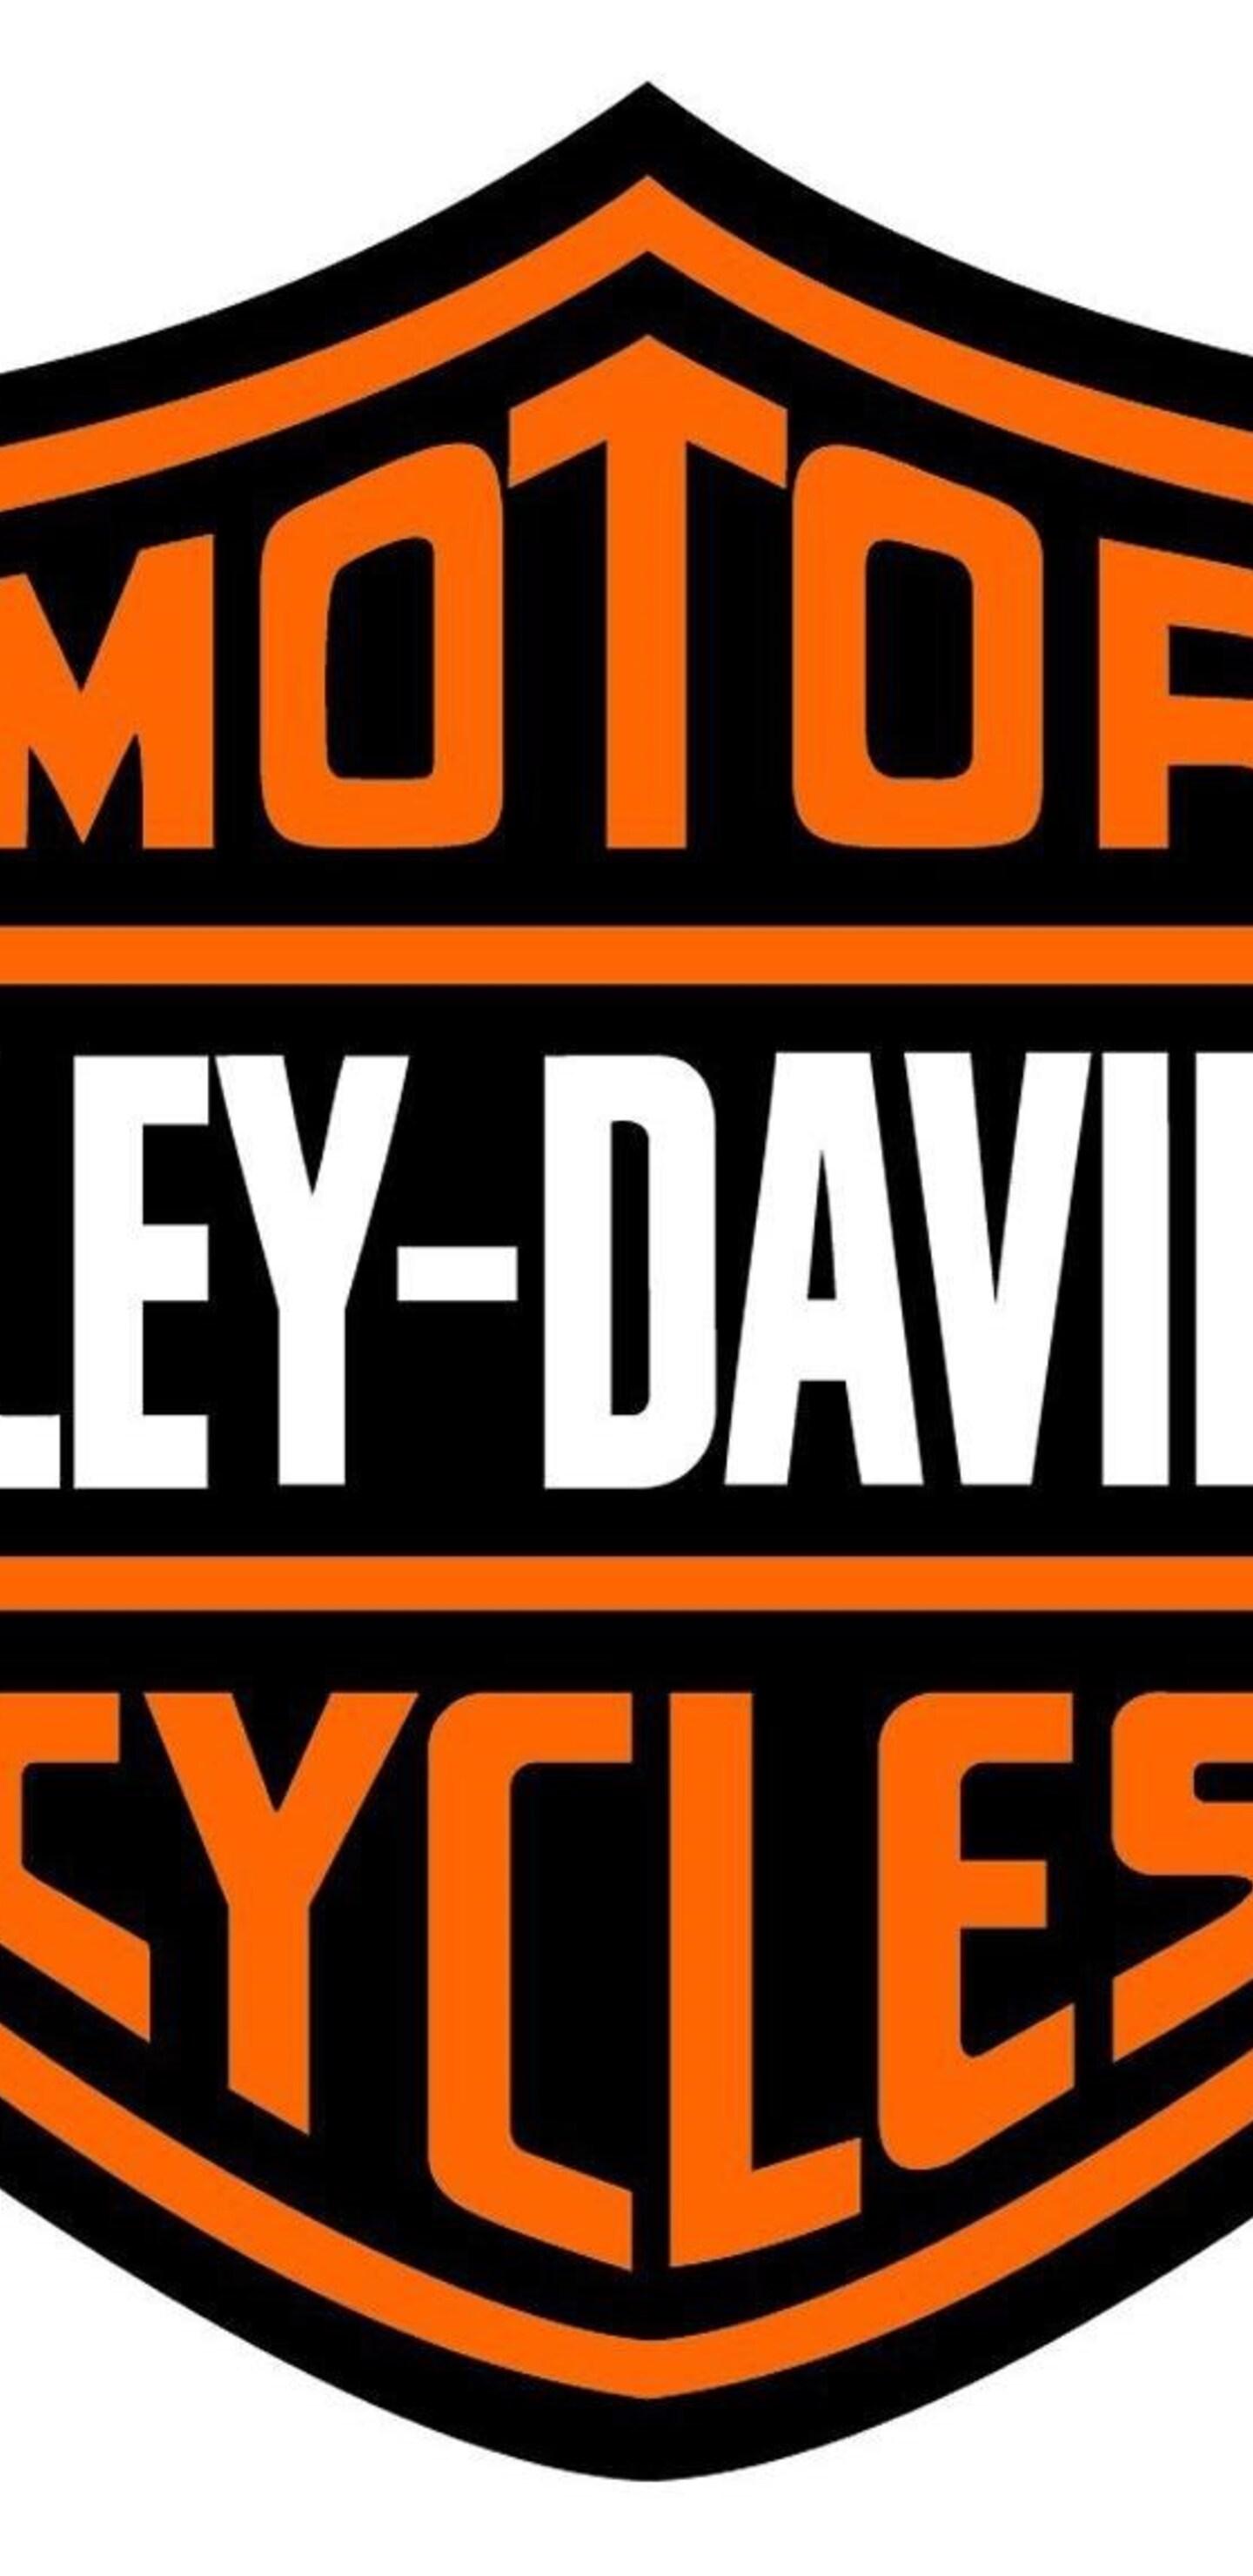 1440x2960 logo harley davidson motor cycles samsung galaxy note 9 8 rh hdqwalls com harley davidson logo wallpaper mural for sale harley davidson logo wallpapers mobile